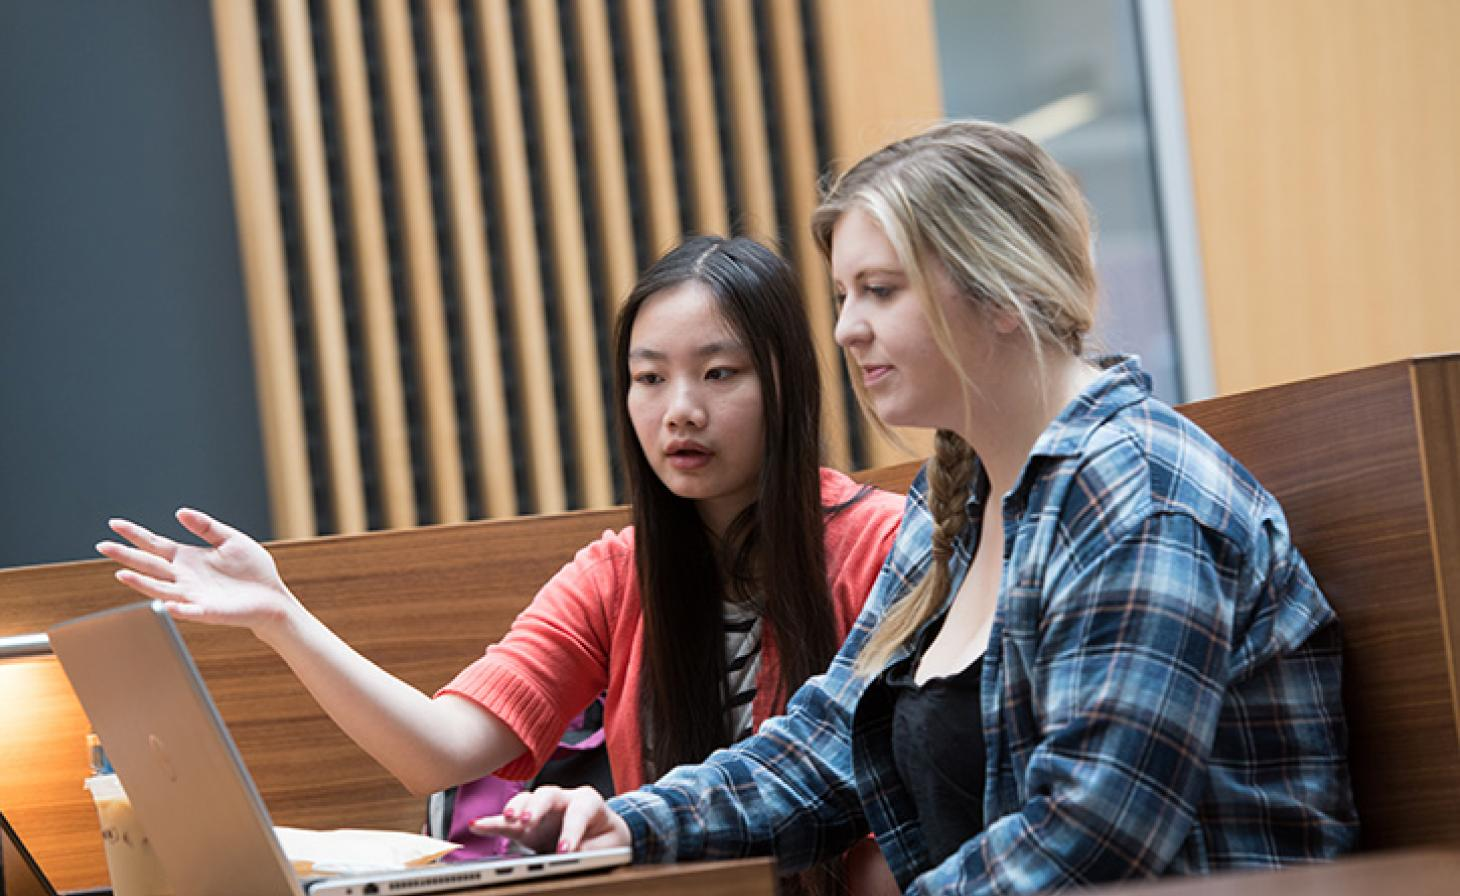 female students working on homework in Austin Hall